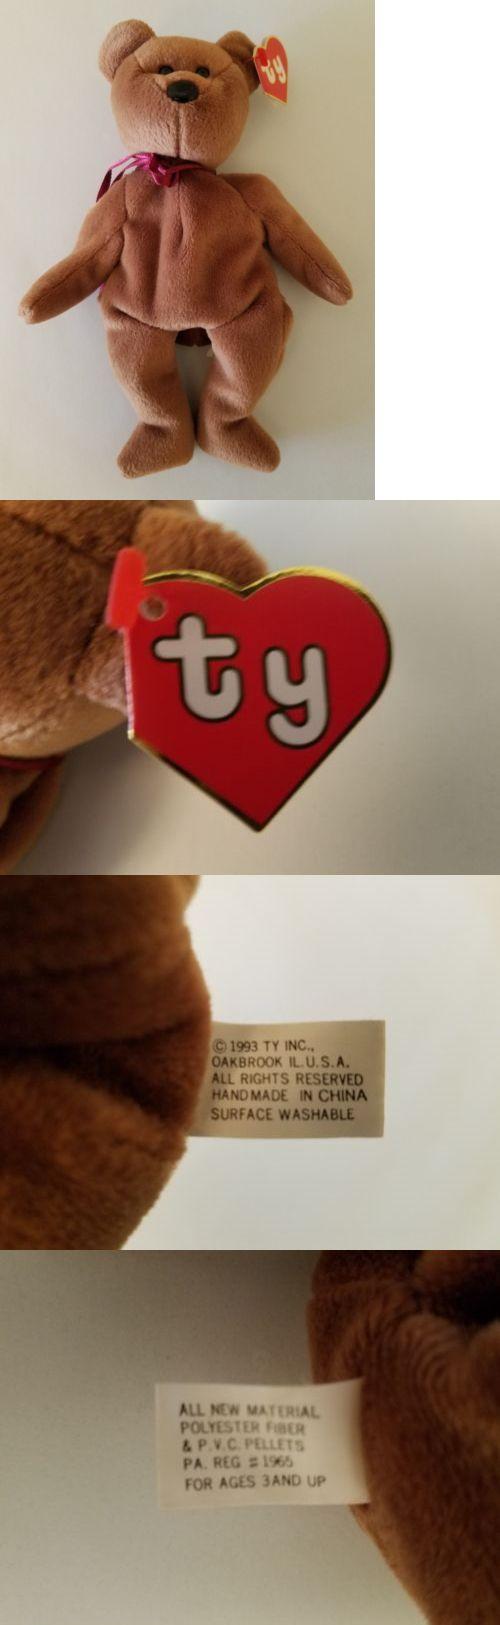 af878454936 Ty 19203  Ty Beanie Baby Teddy (Brown